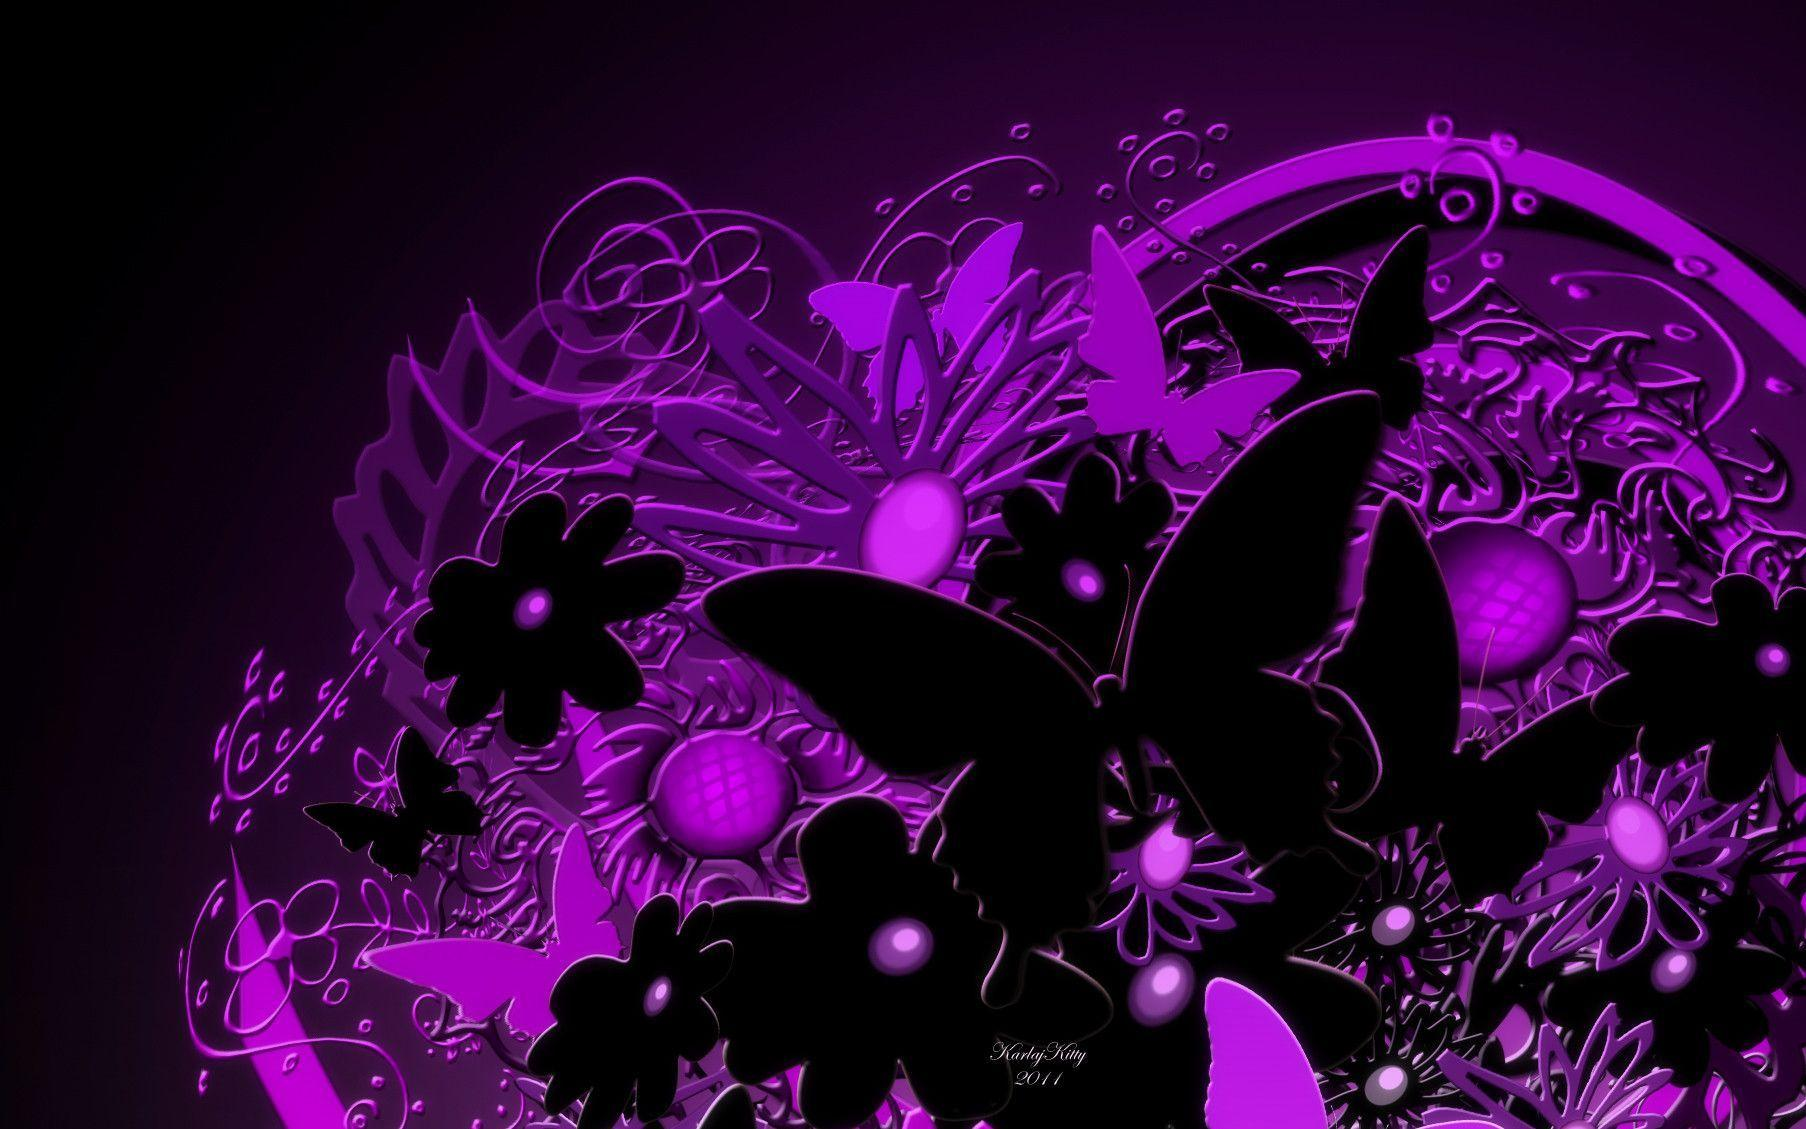 Purple And Black Hearts Wallpaper: Purple Butterfly Wallpapers